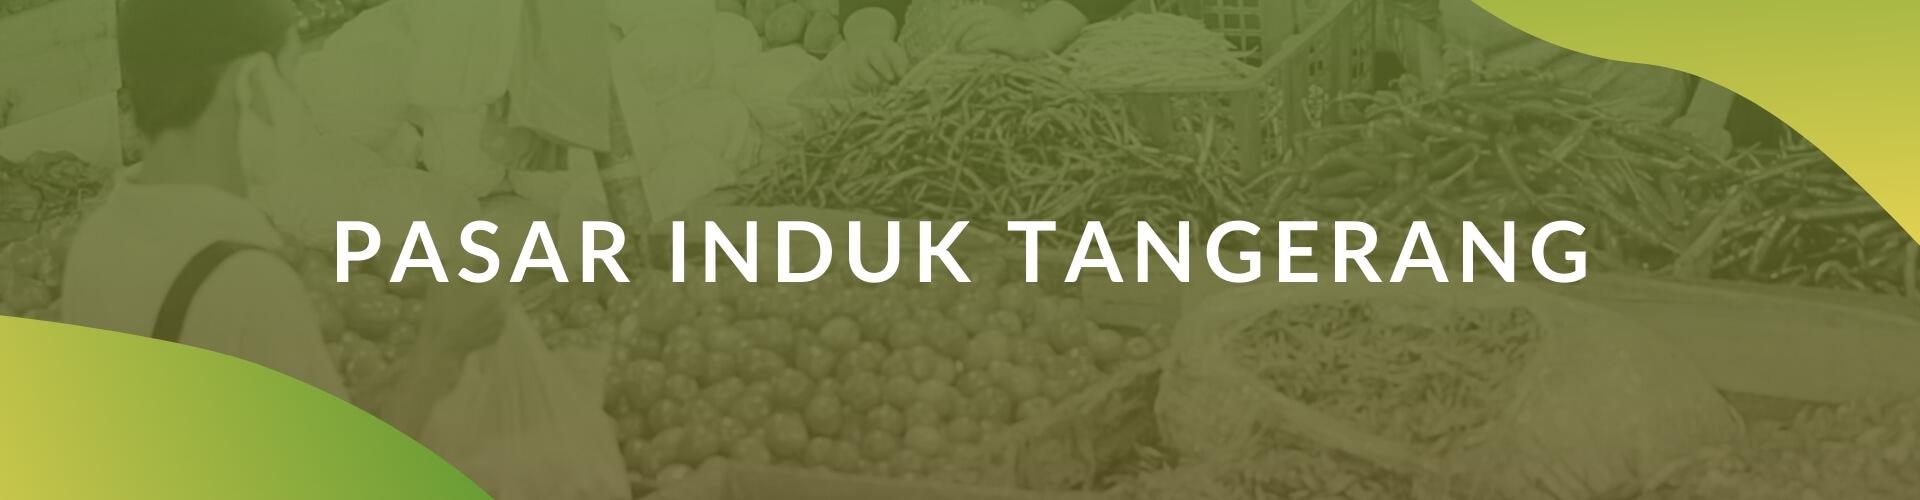 Paskomnas Jaringan Pasar Induk Tangerang